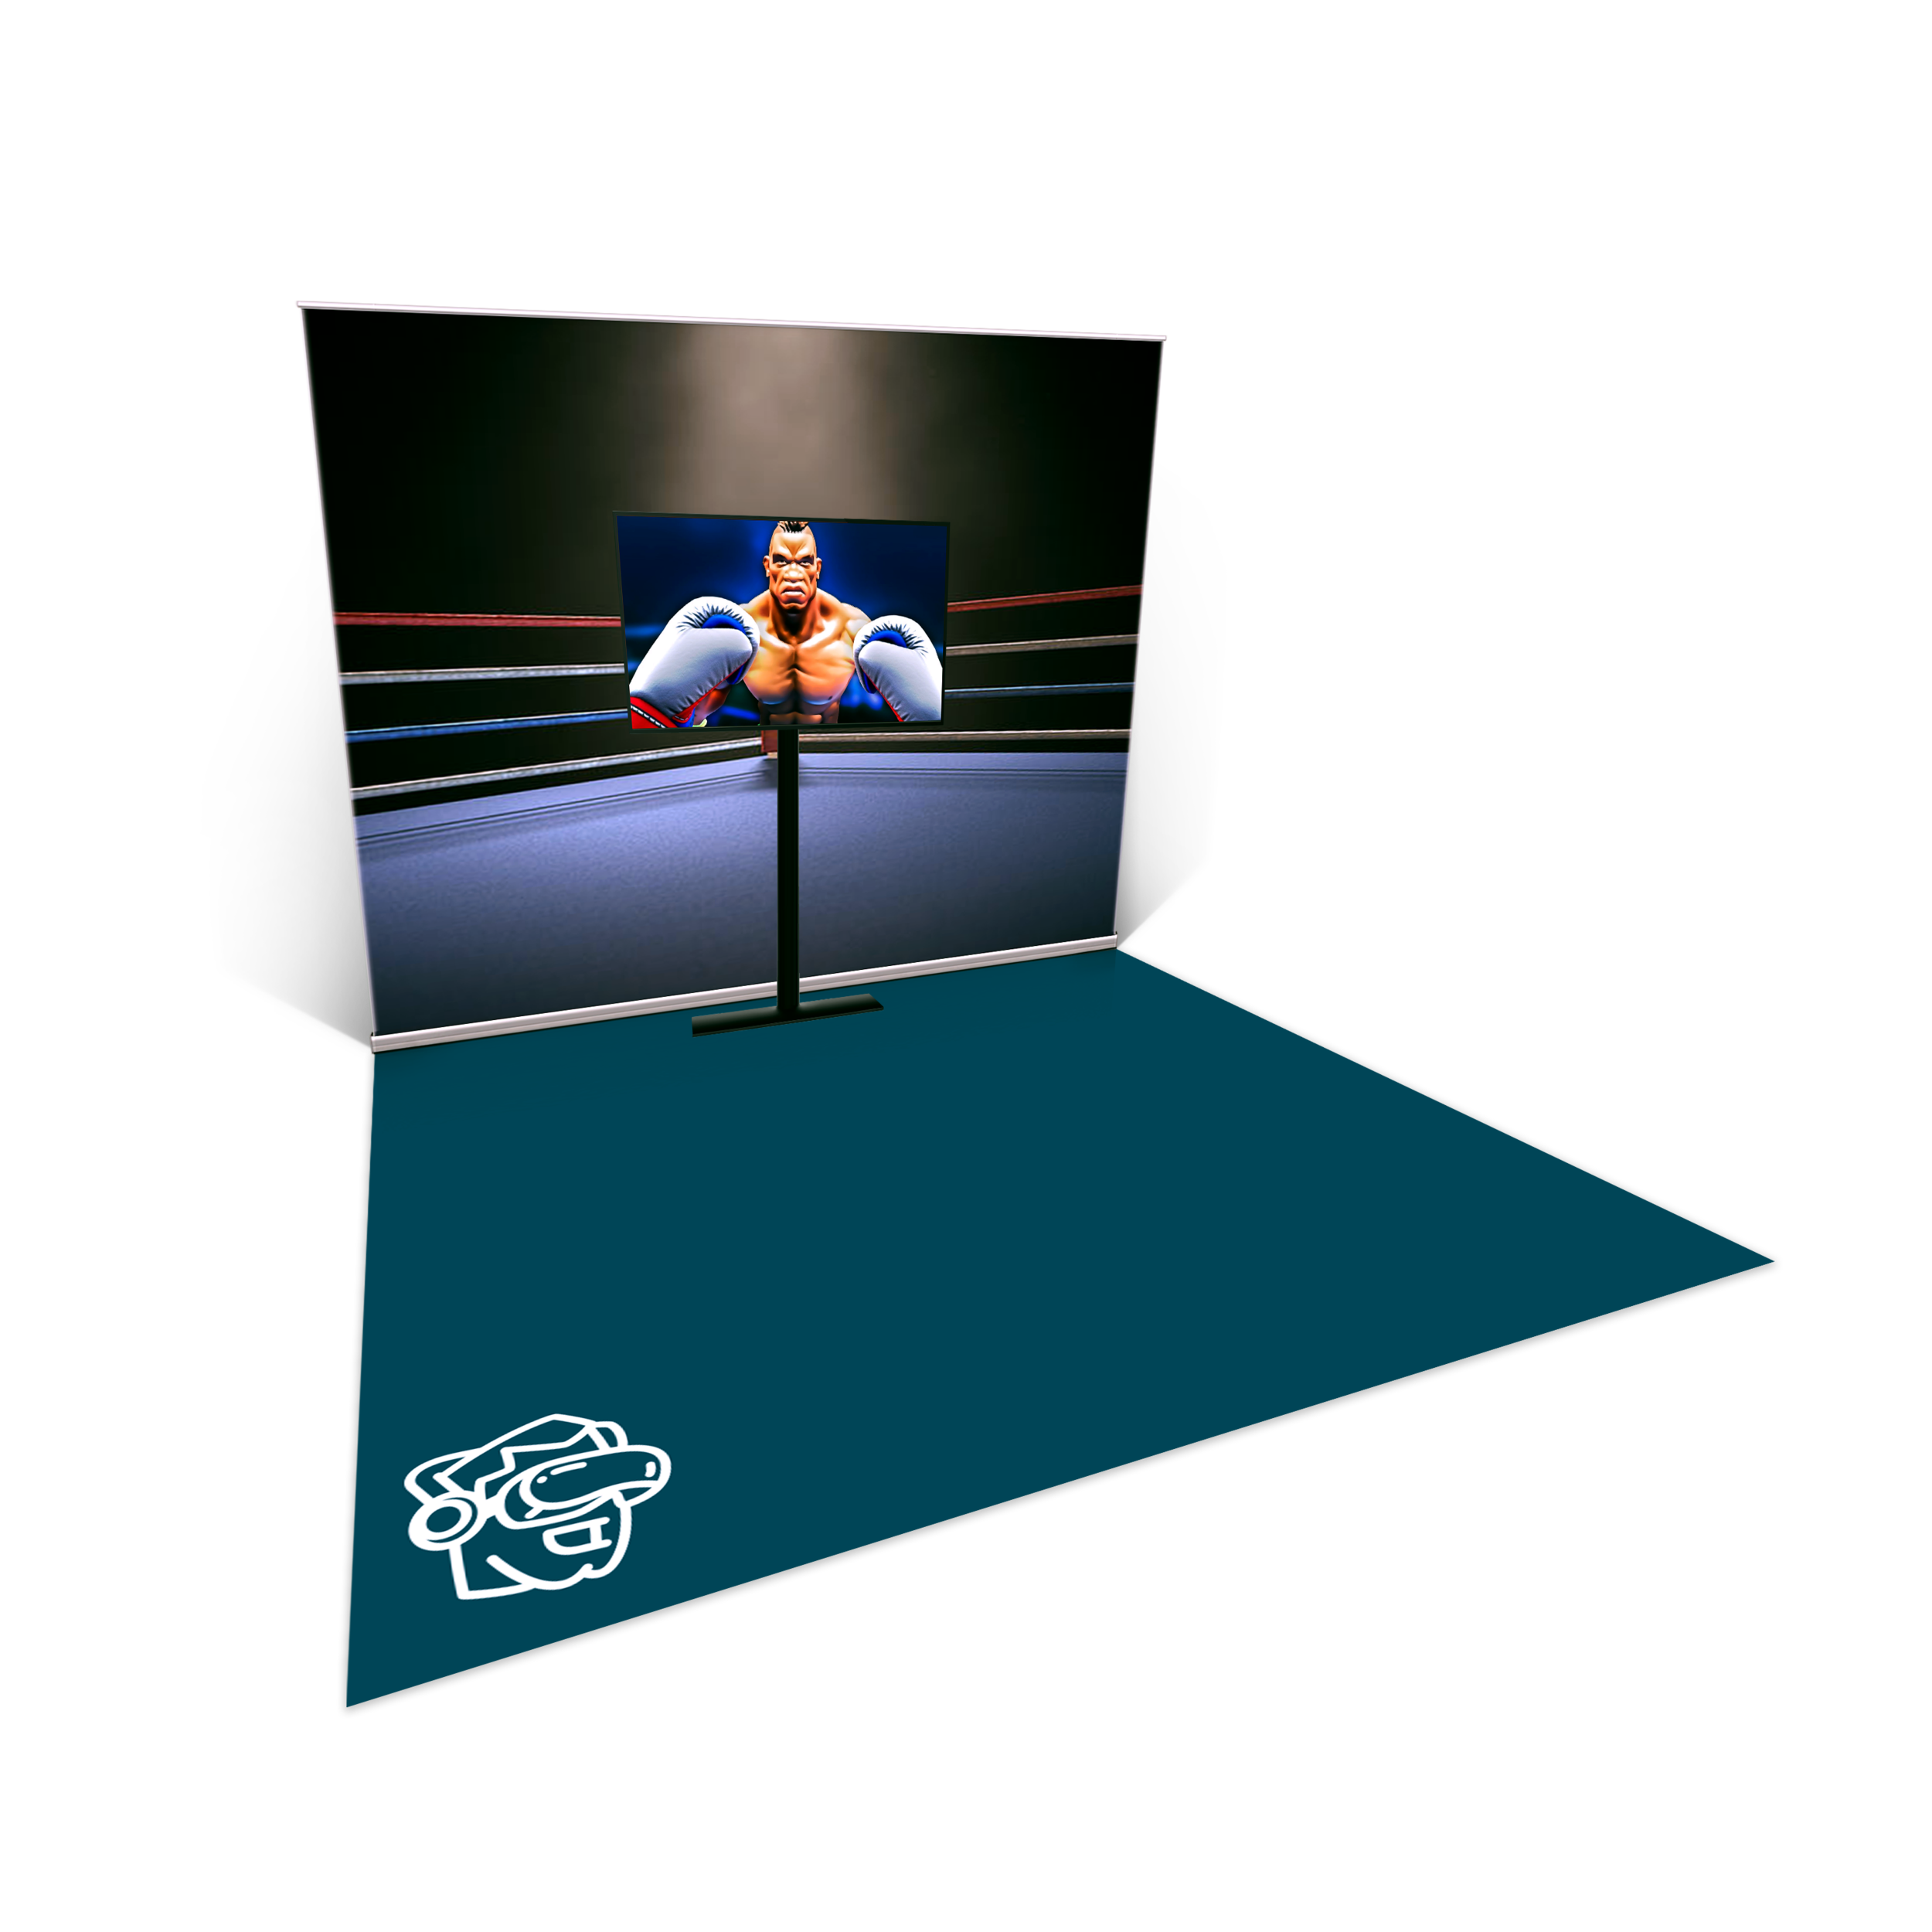 Setup_Mockup_-_VR_Boxing_Simulator.png